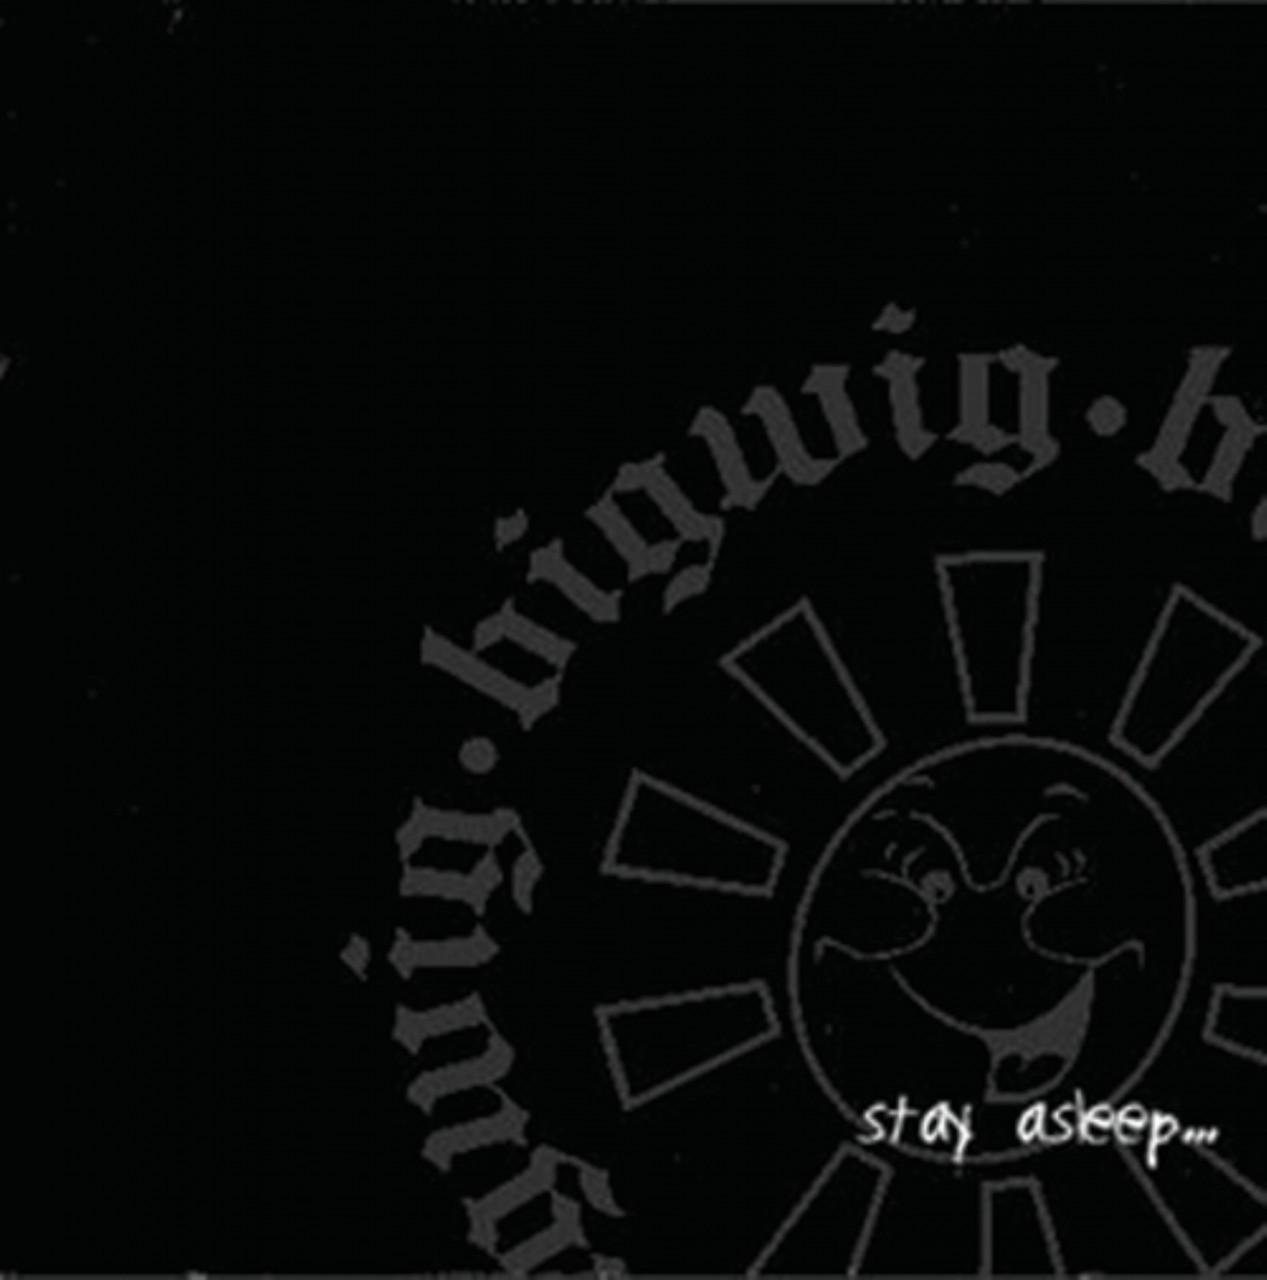 Bigwig - Stay Asleep LP